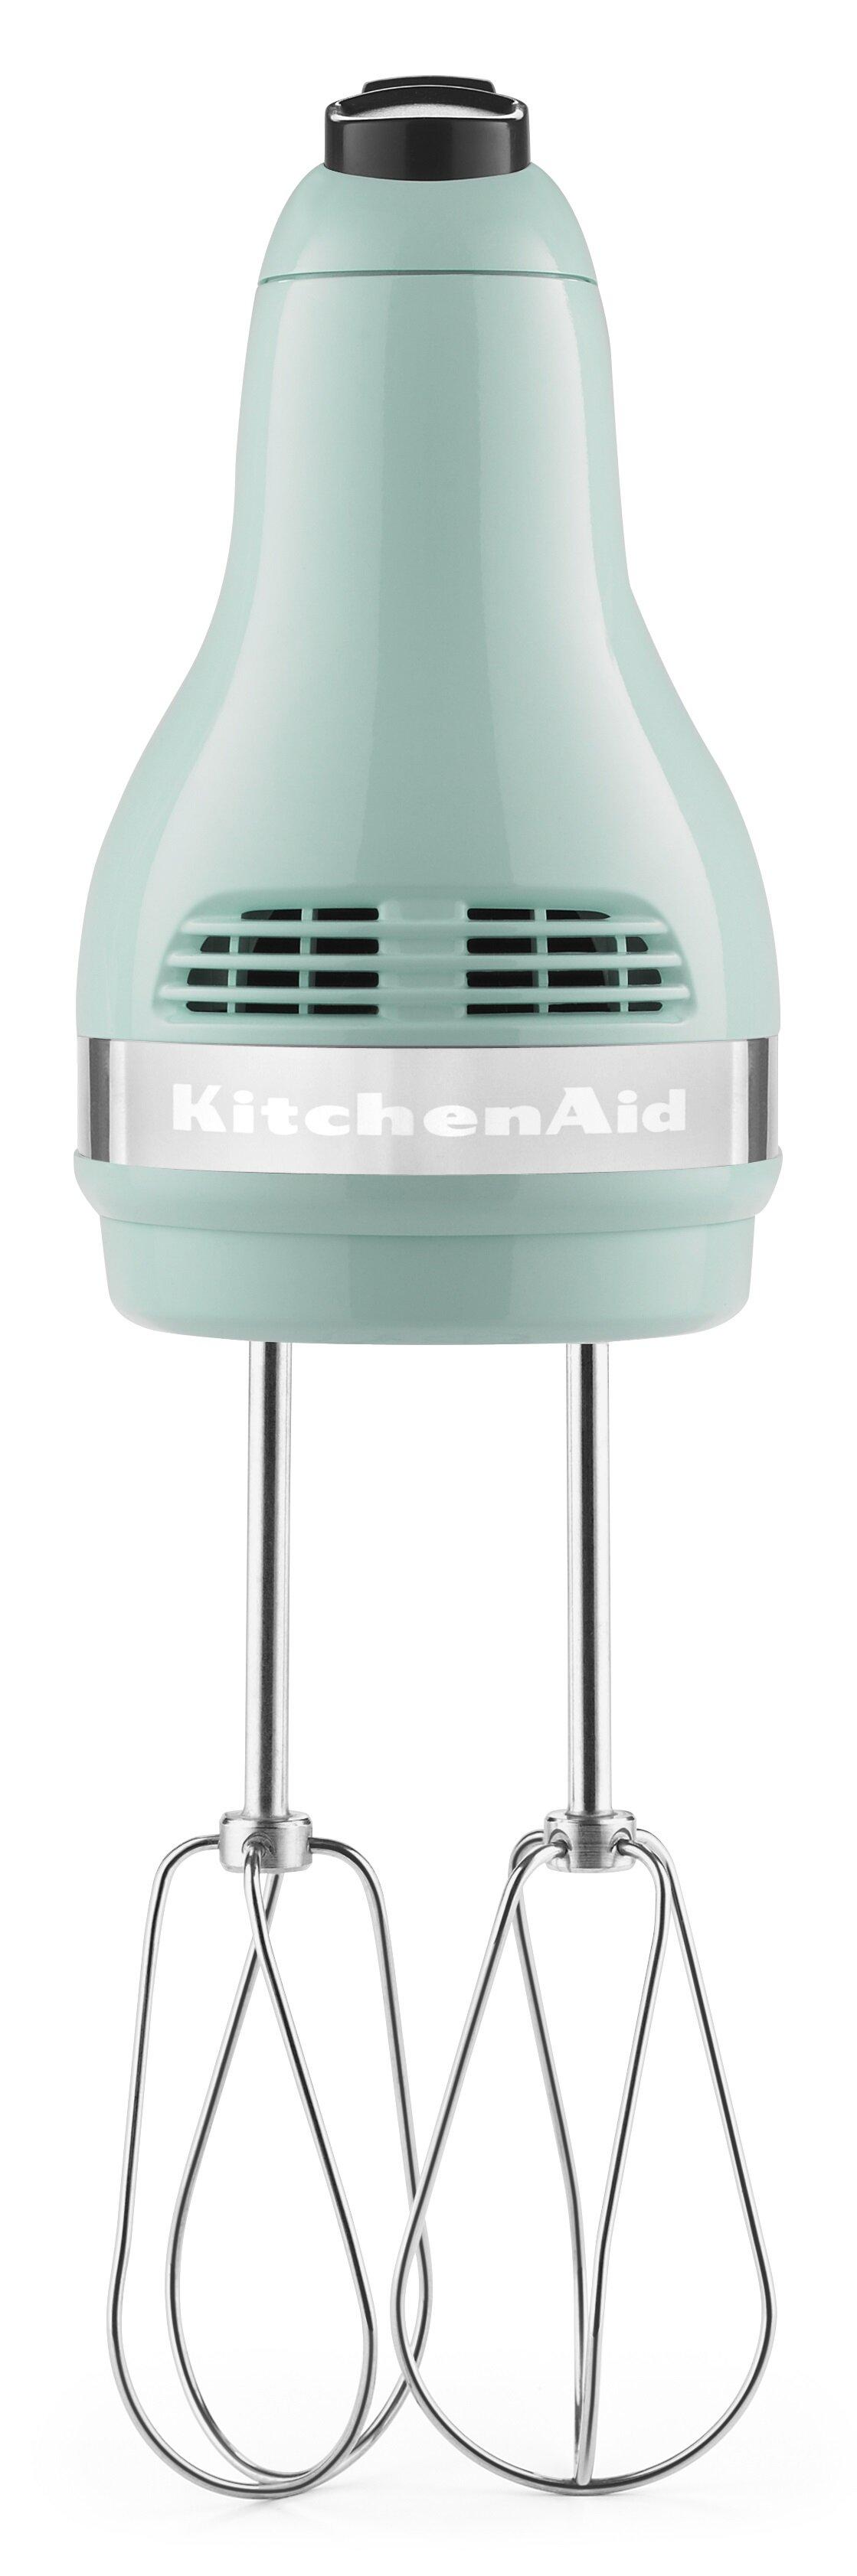 Fabulous Kitchenaid Ultra Power 5 Speed Hand Mixer Download Free Architecture Designs Crovemadebymaigaardcom